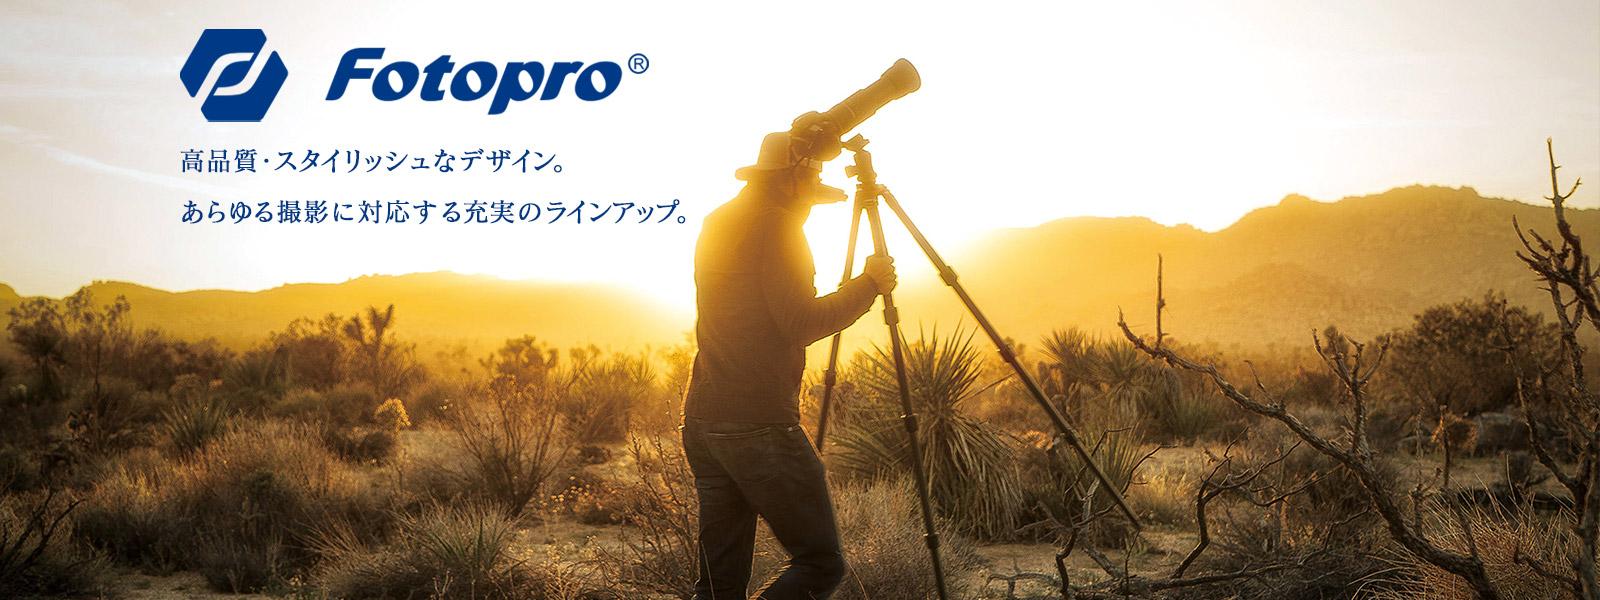 Fotopro 高品質・スタイリッシュなデザイン。あらゆる撮影に対応する充実のラインアップ。